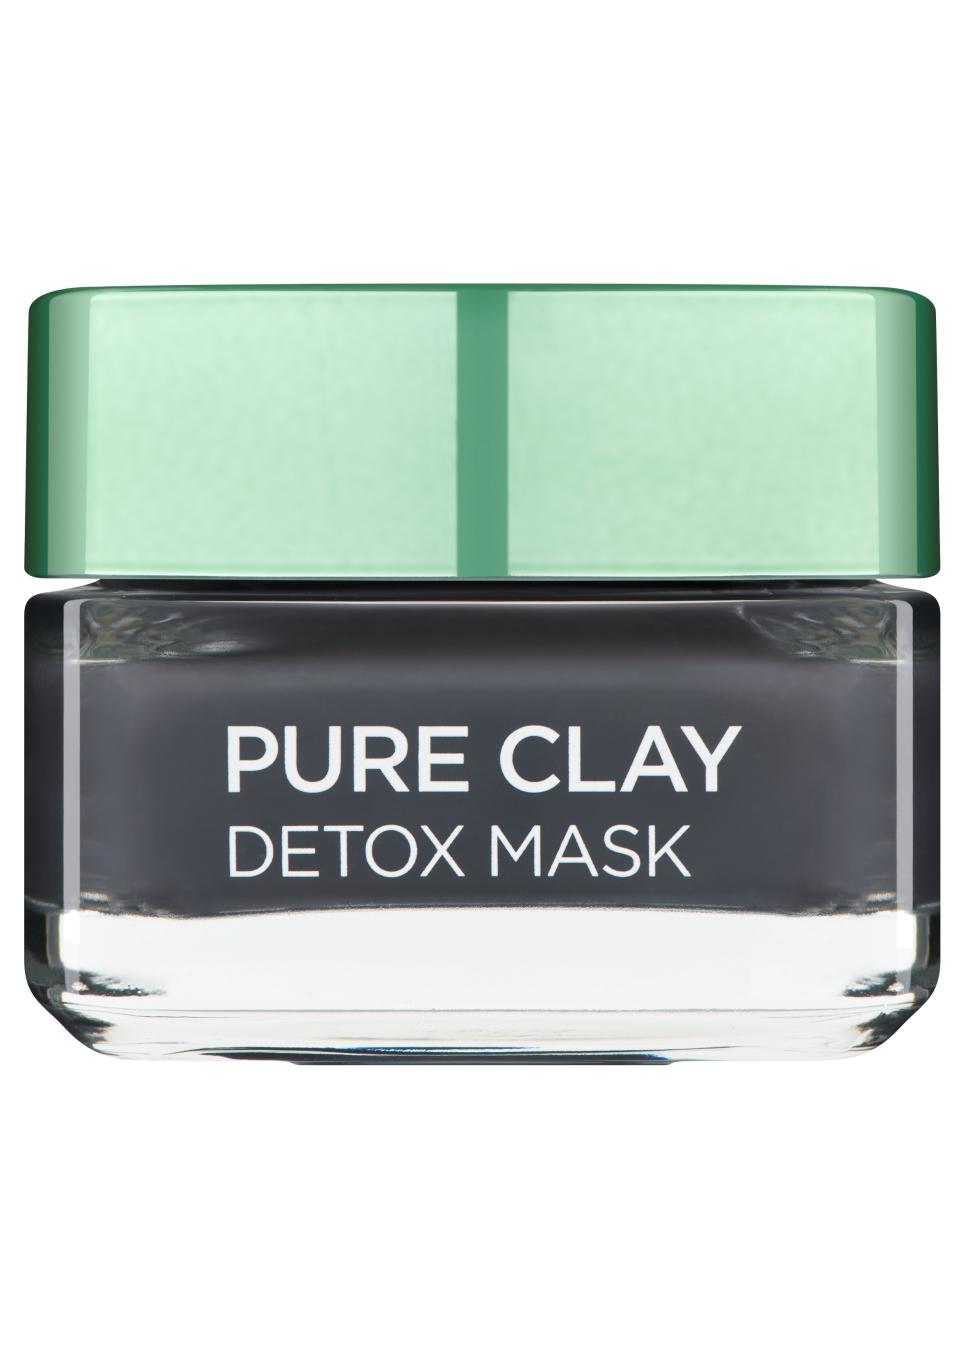 Skin Care - Loreal Pure Clay Detox Mask